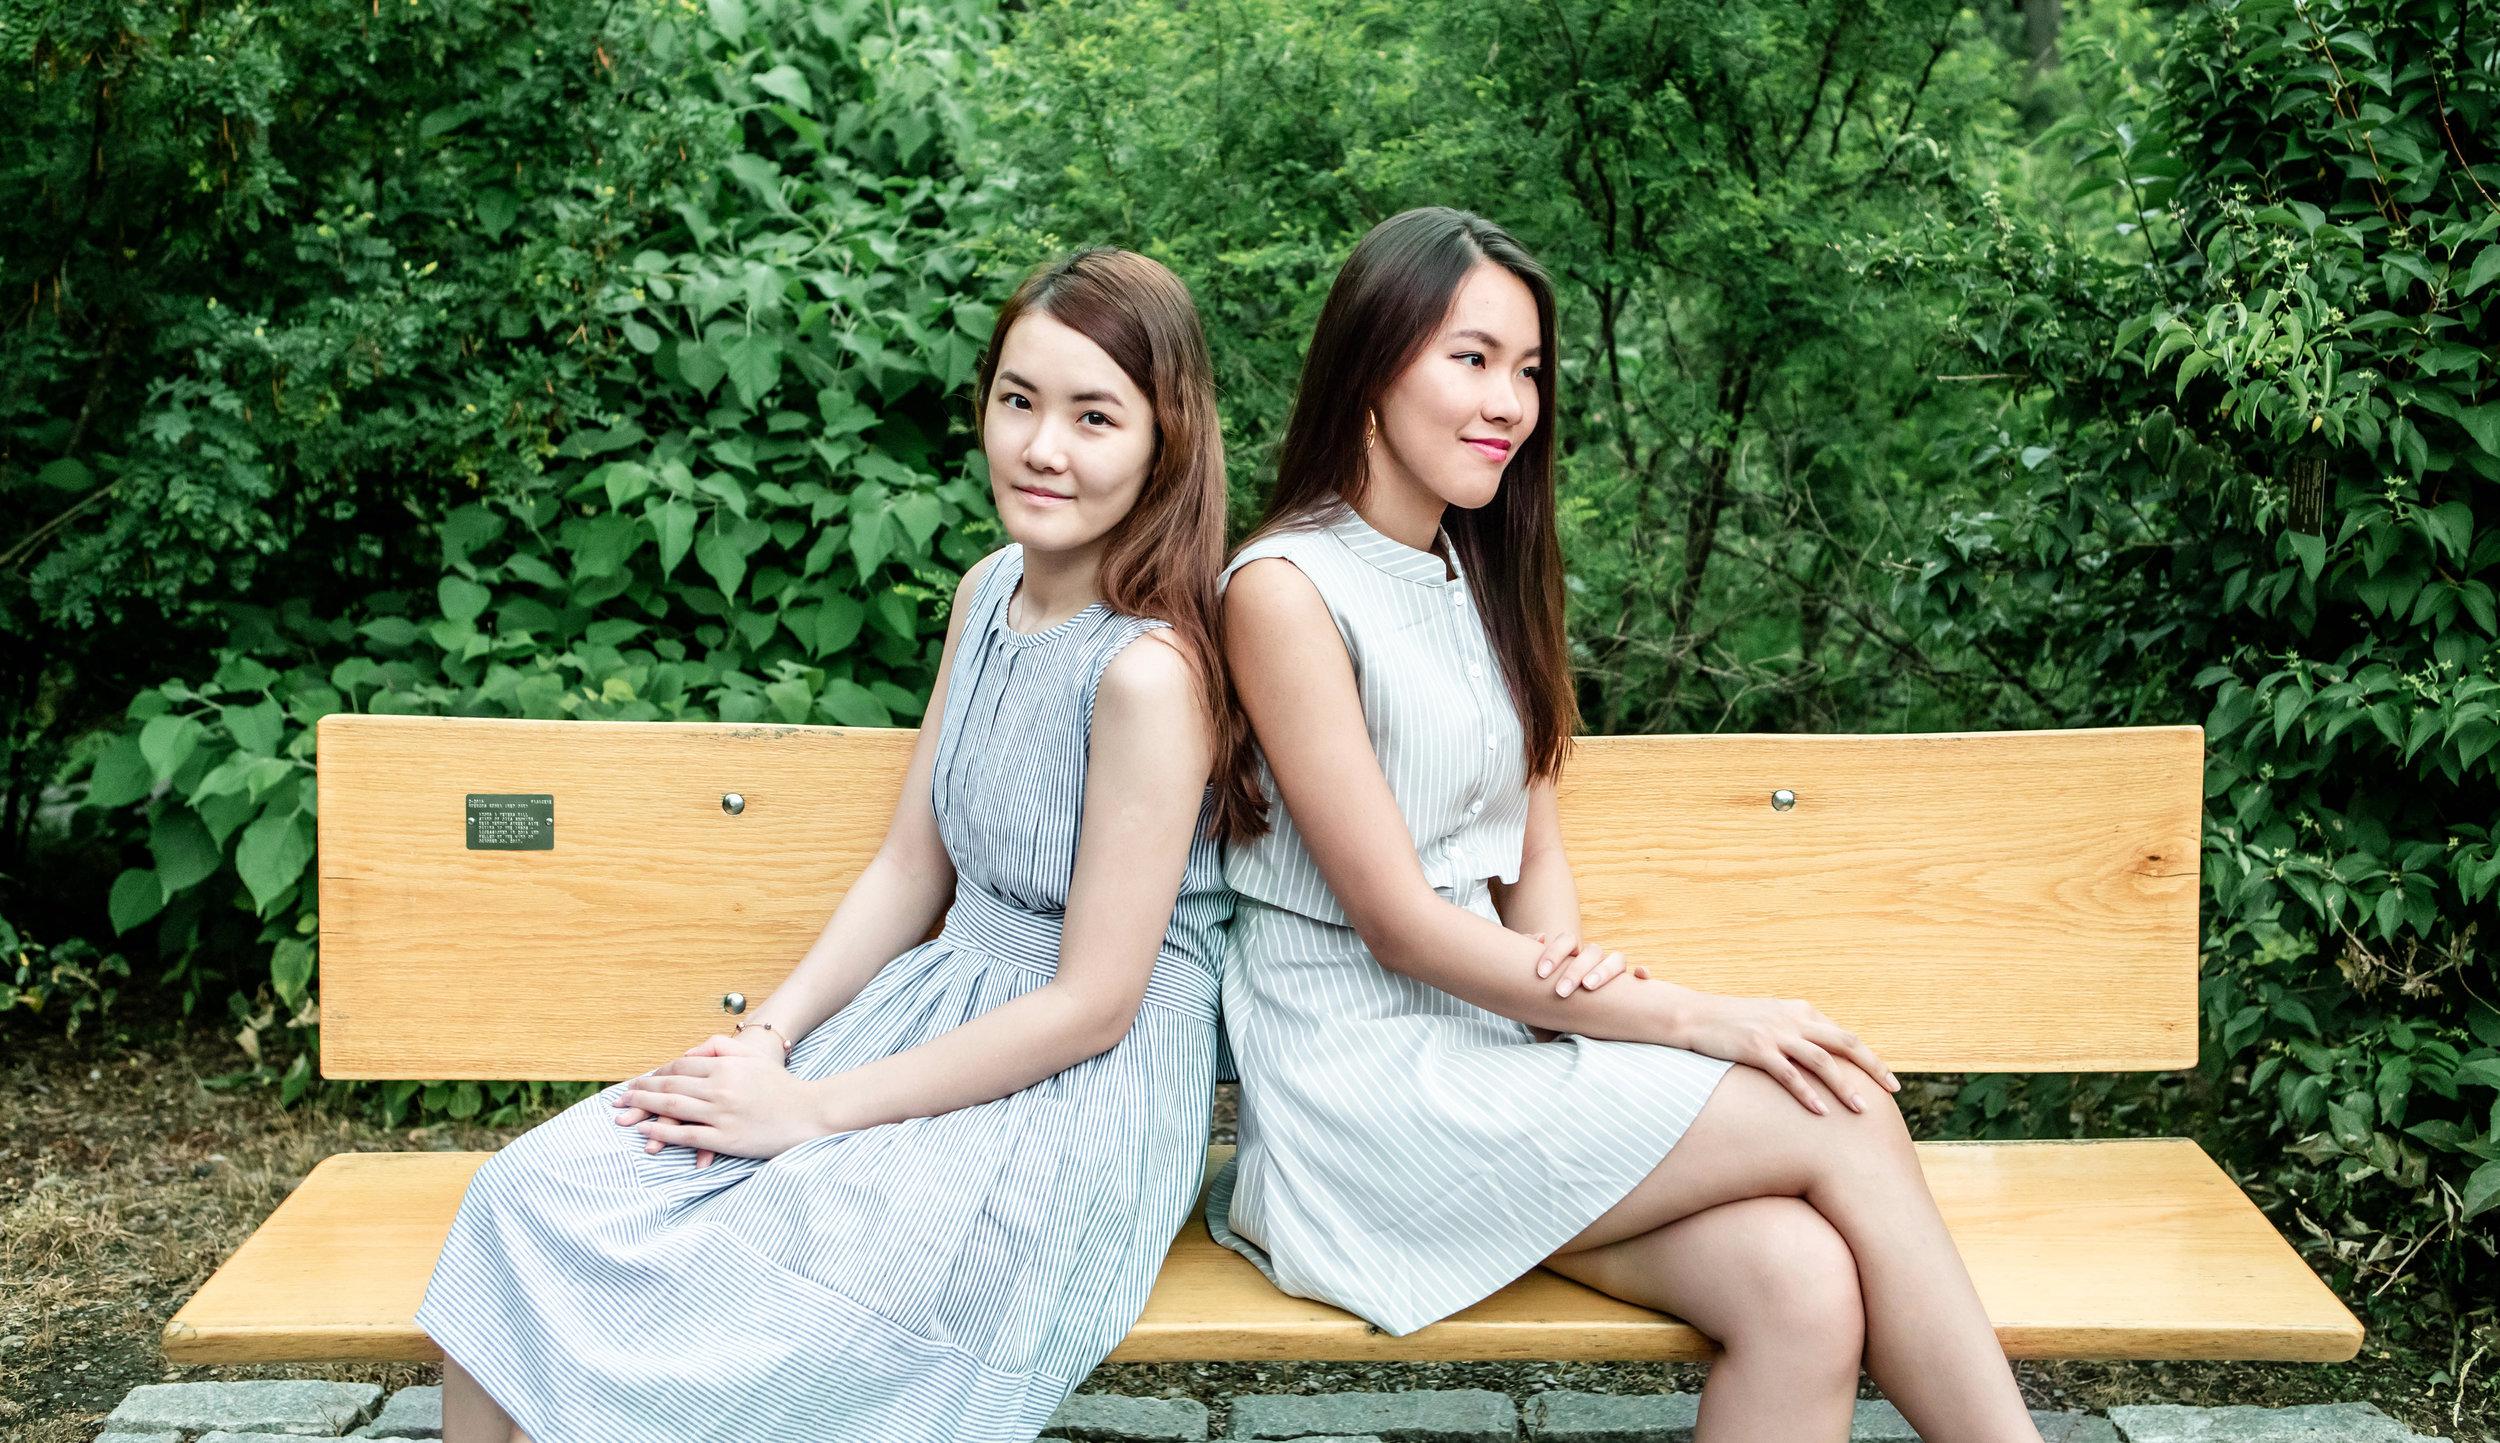 sisters-in-summertime-eva-loh-15.jpg